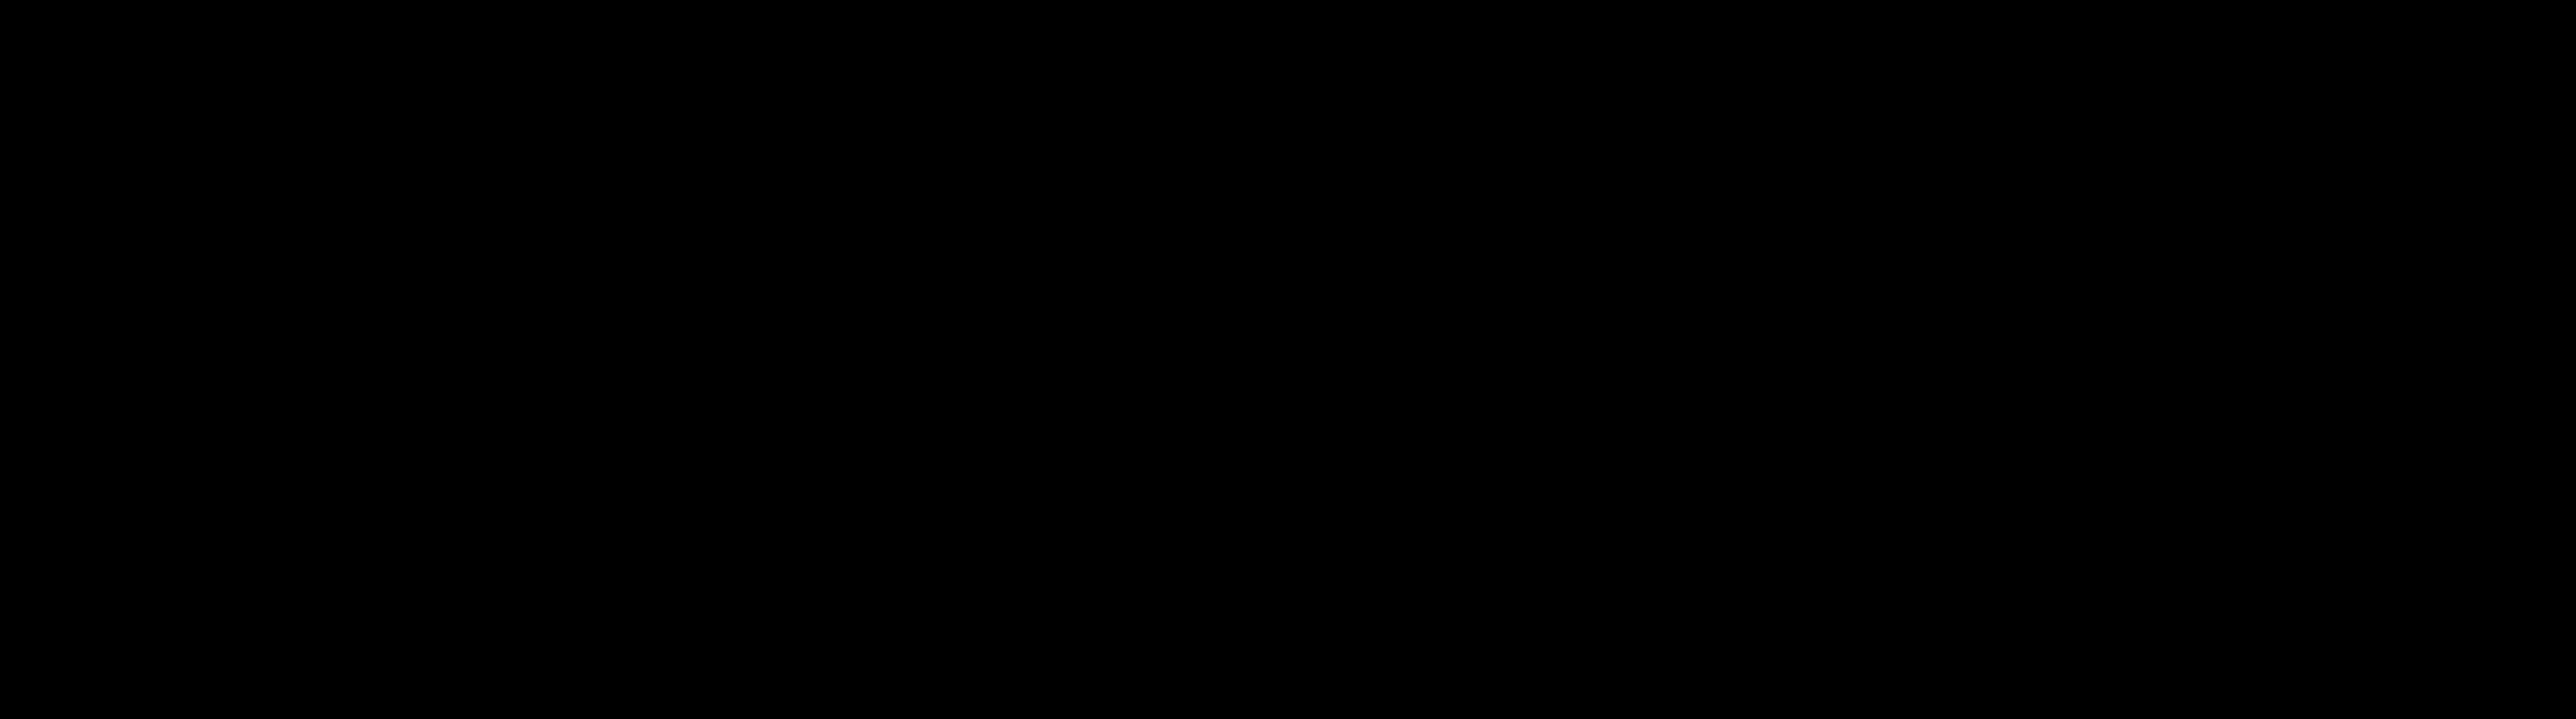 Clarks_logo_logotype-1